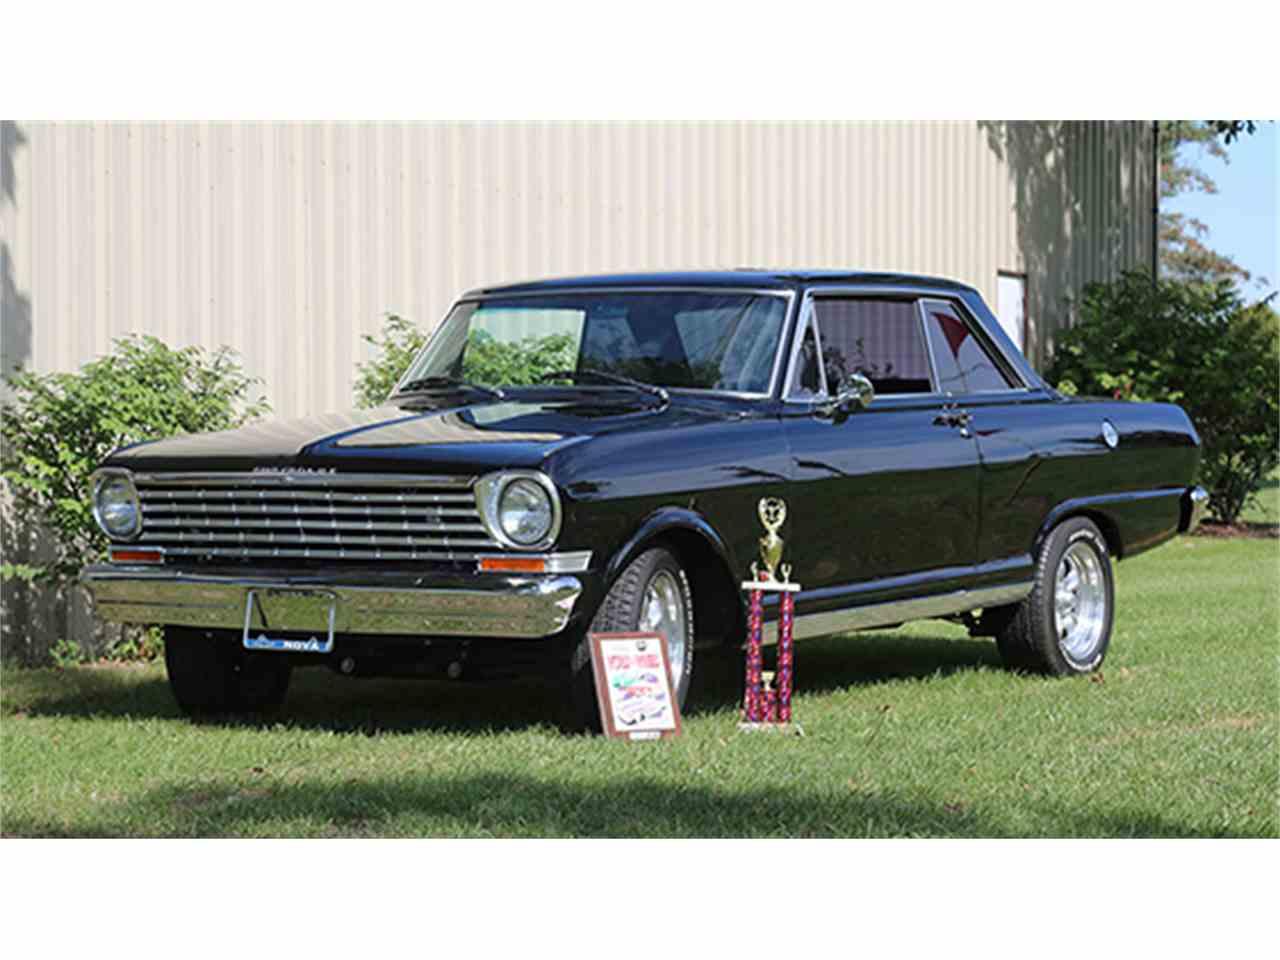 1963 chevrolet chevy ii nova ss sport coupe for sale cc 1009119. Black Bedroom Furniture Sets. Home Design Ideas